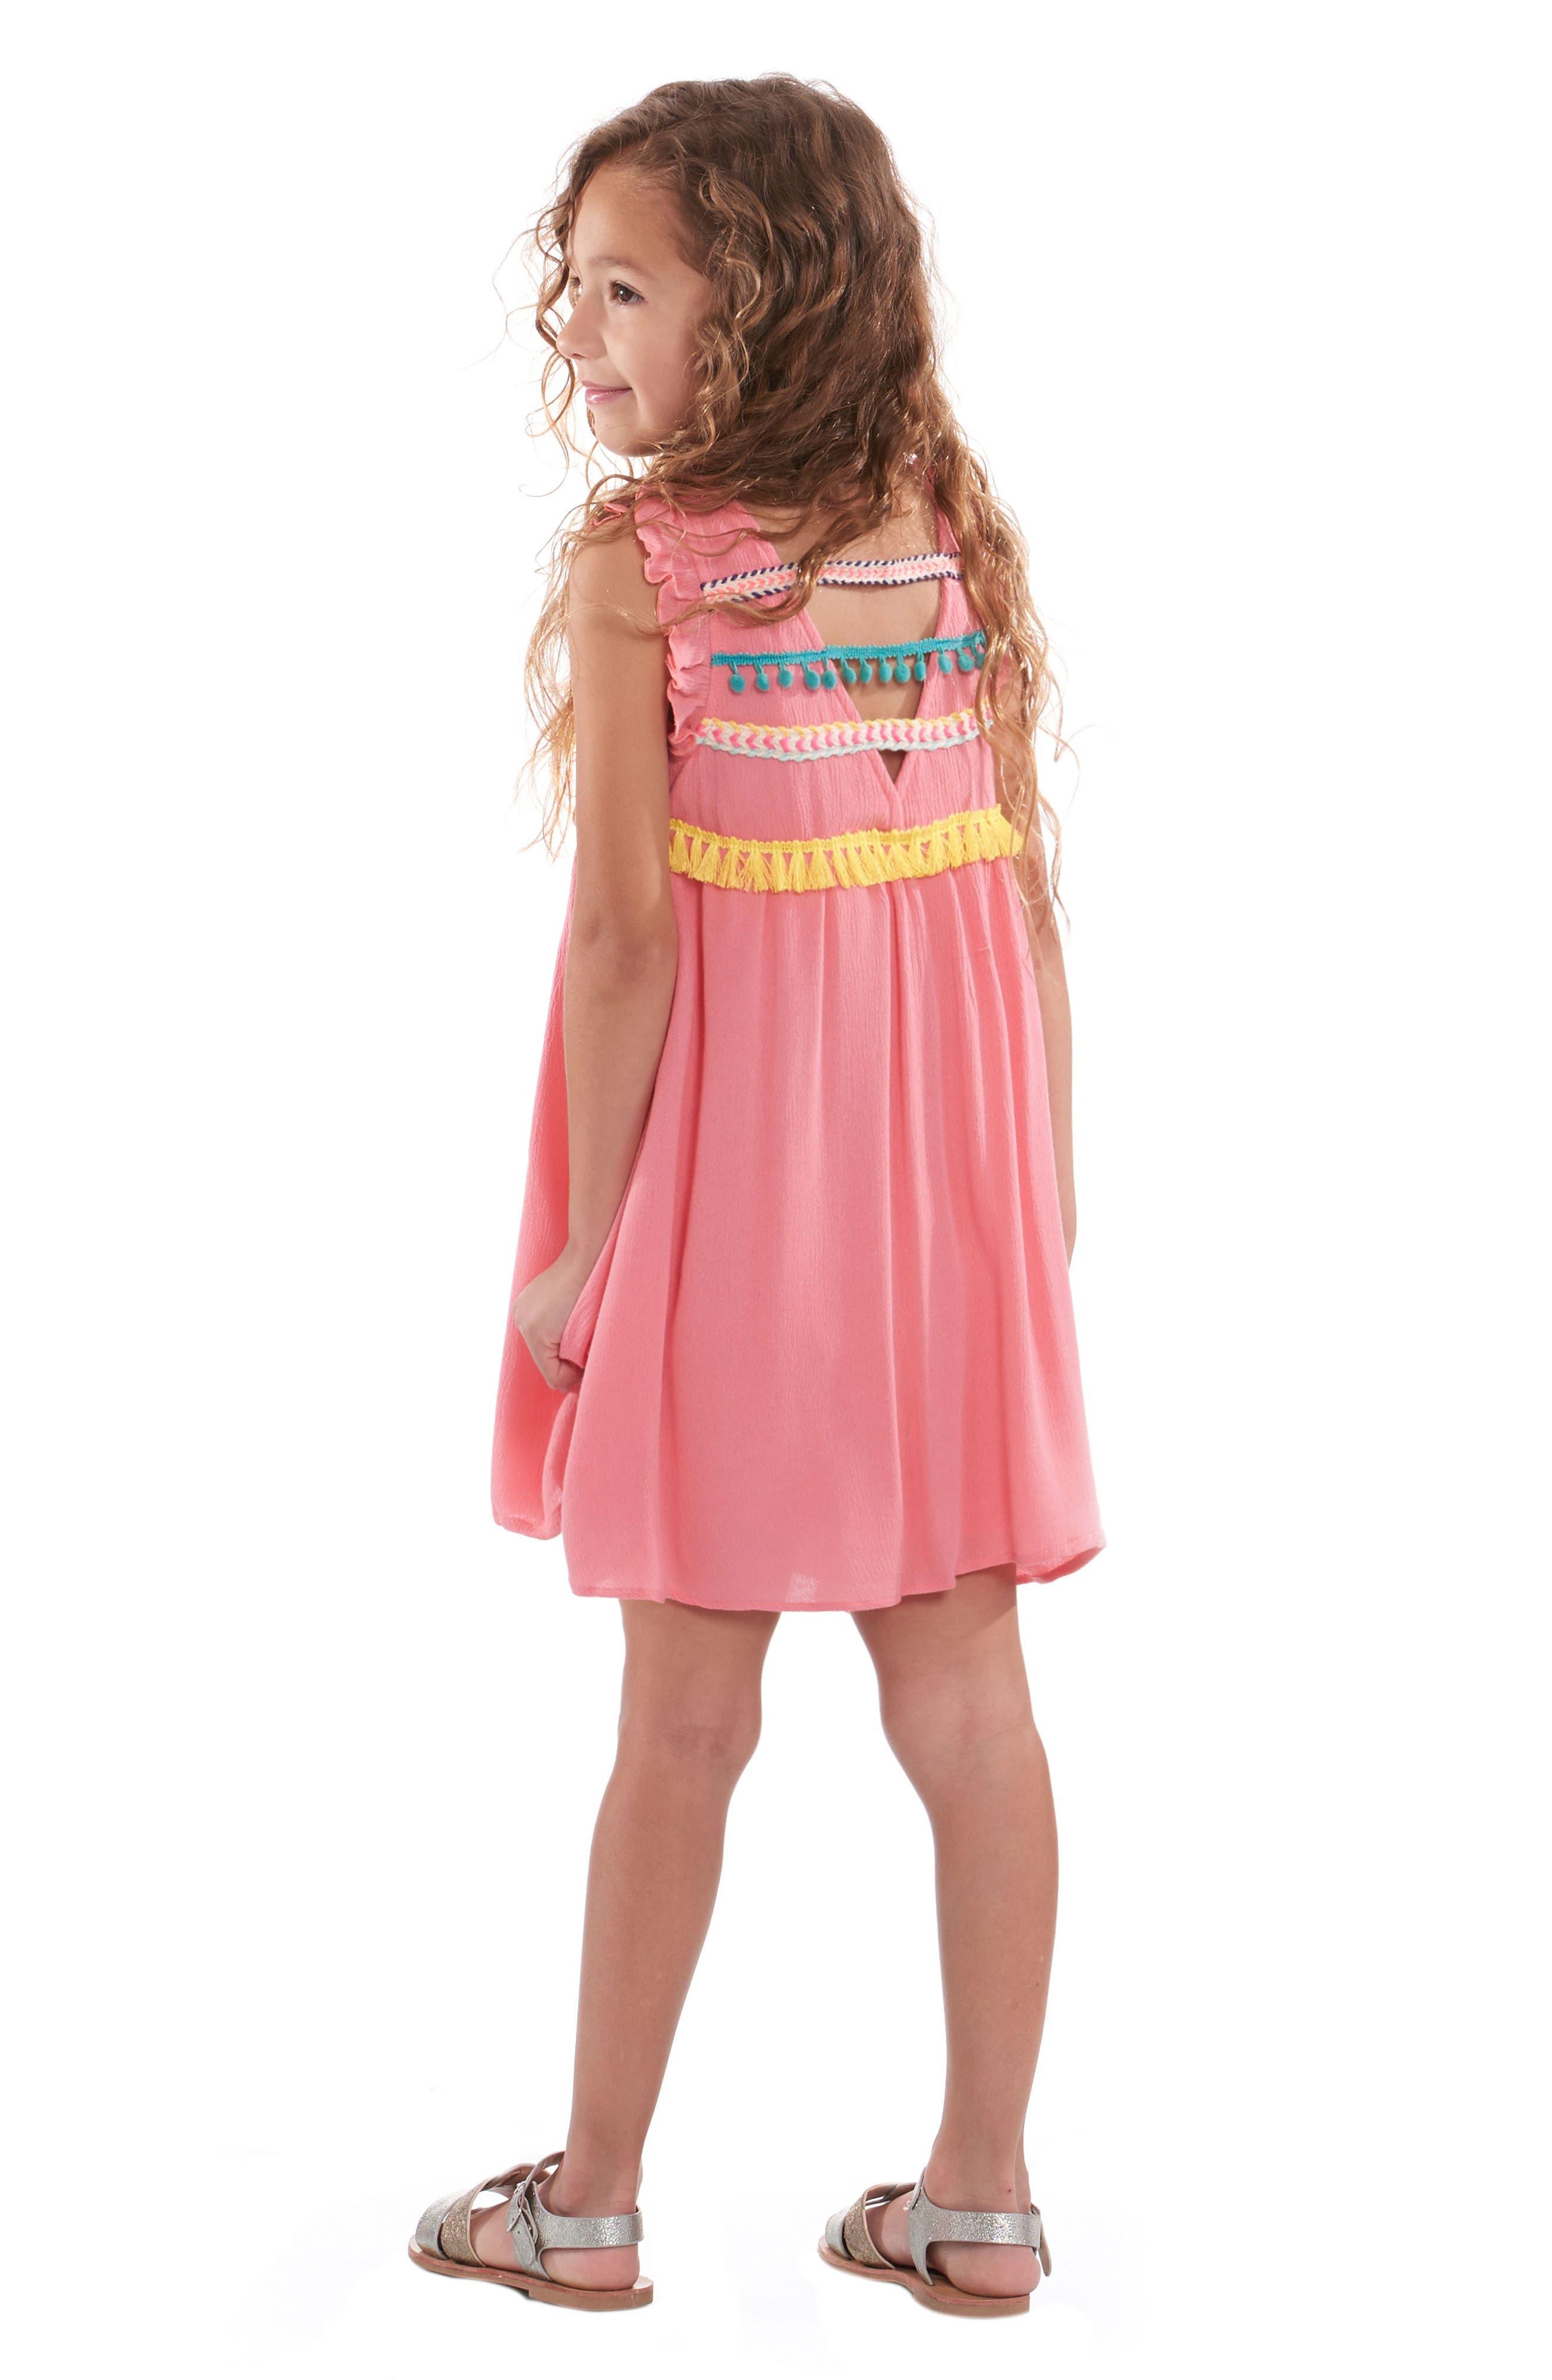 Trim Babydoll Dress,                             Alternate thumbnail 3, color,                             951